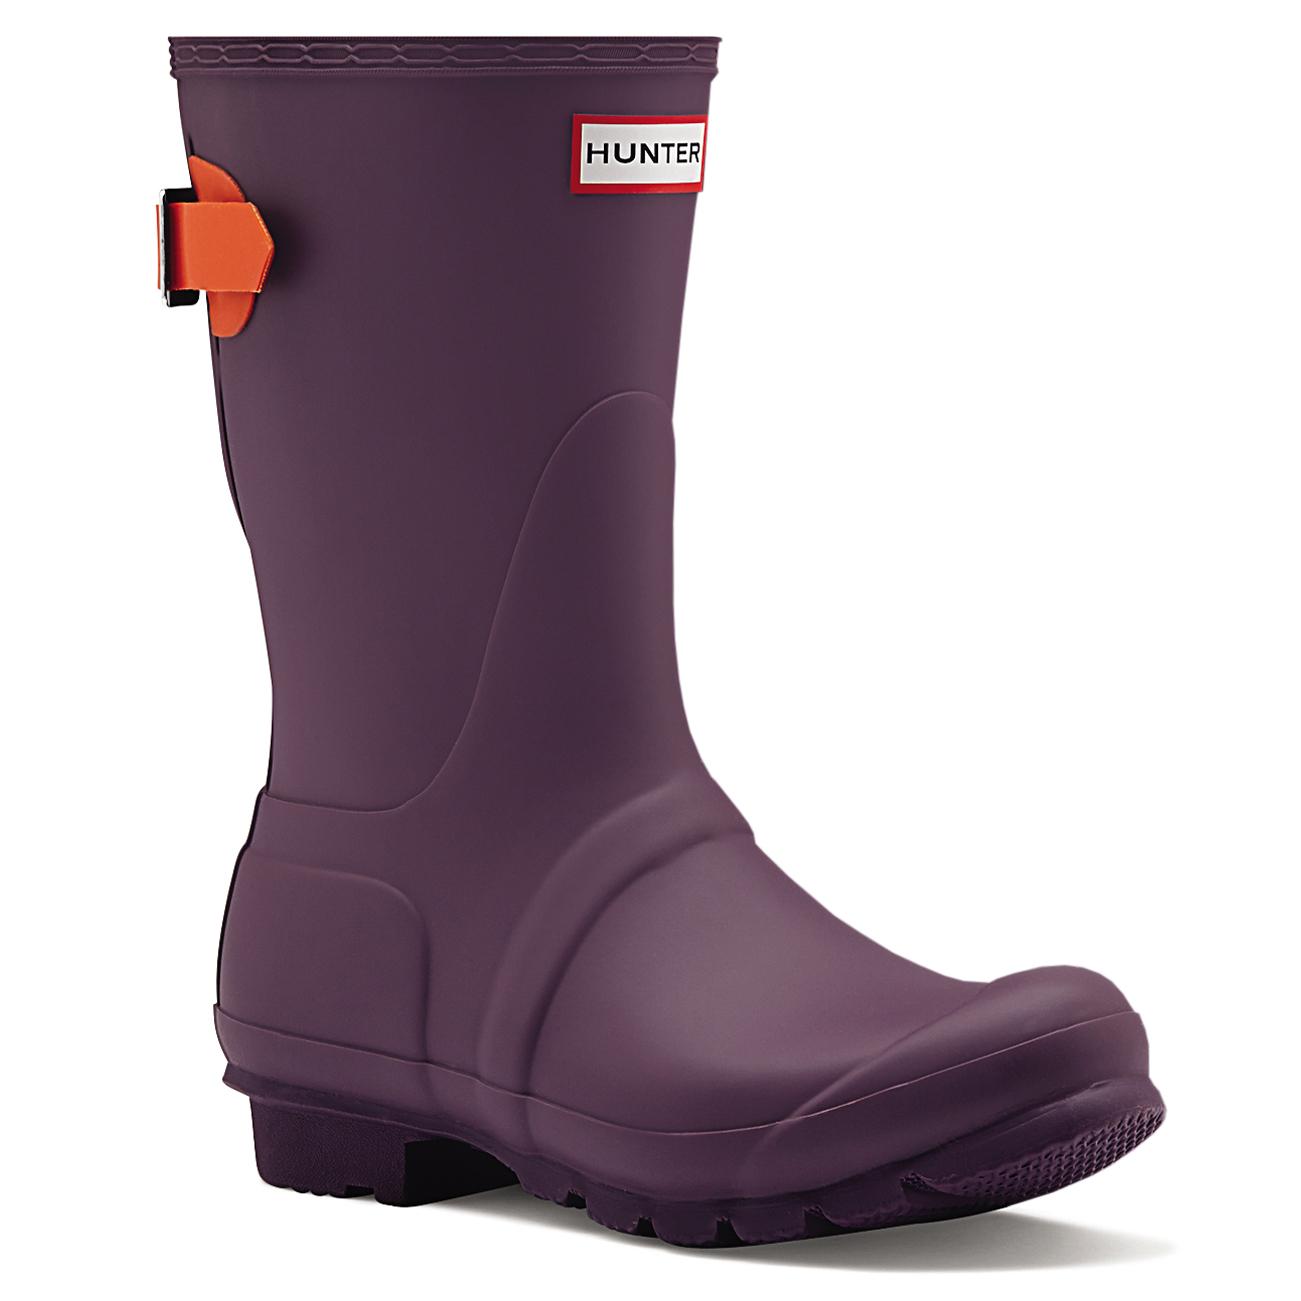 Original Refresh Hunter-03 Womenu0026#39;s Lace Up Waterproof Duck Mid Calf Rain Winter Boots | EBay